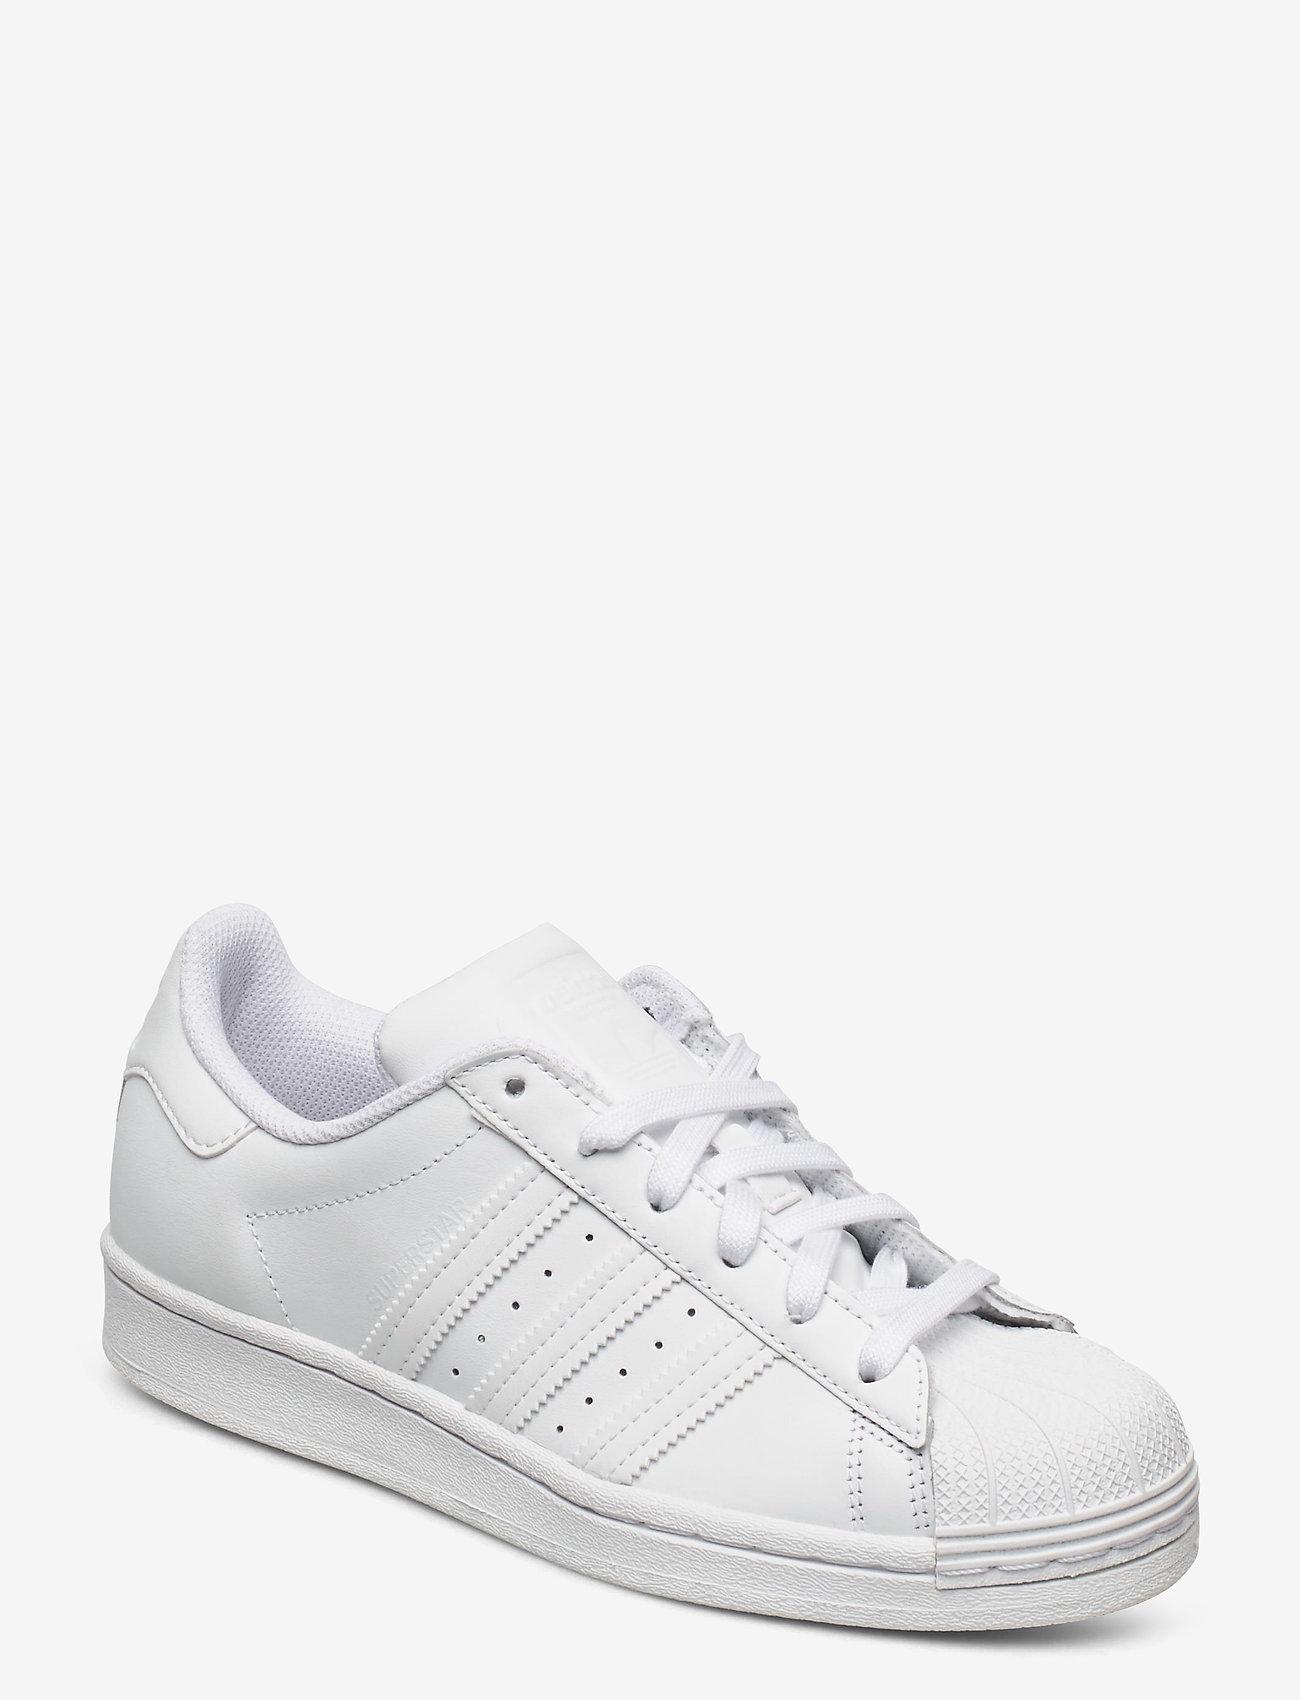 adidas Originals - Superstar  W - låga sneakers - ftwwht/ftwwht/ftwwht - 1